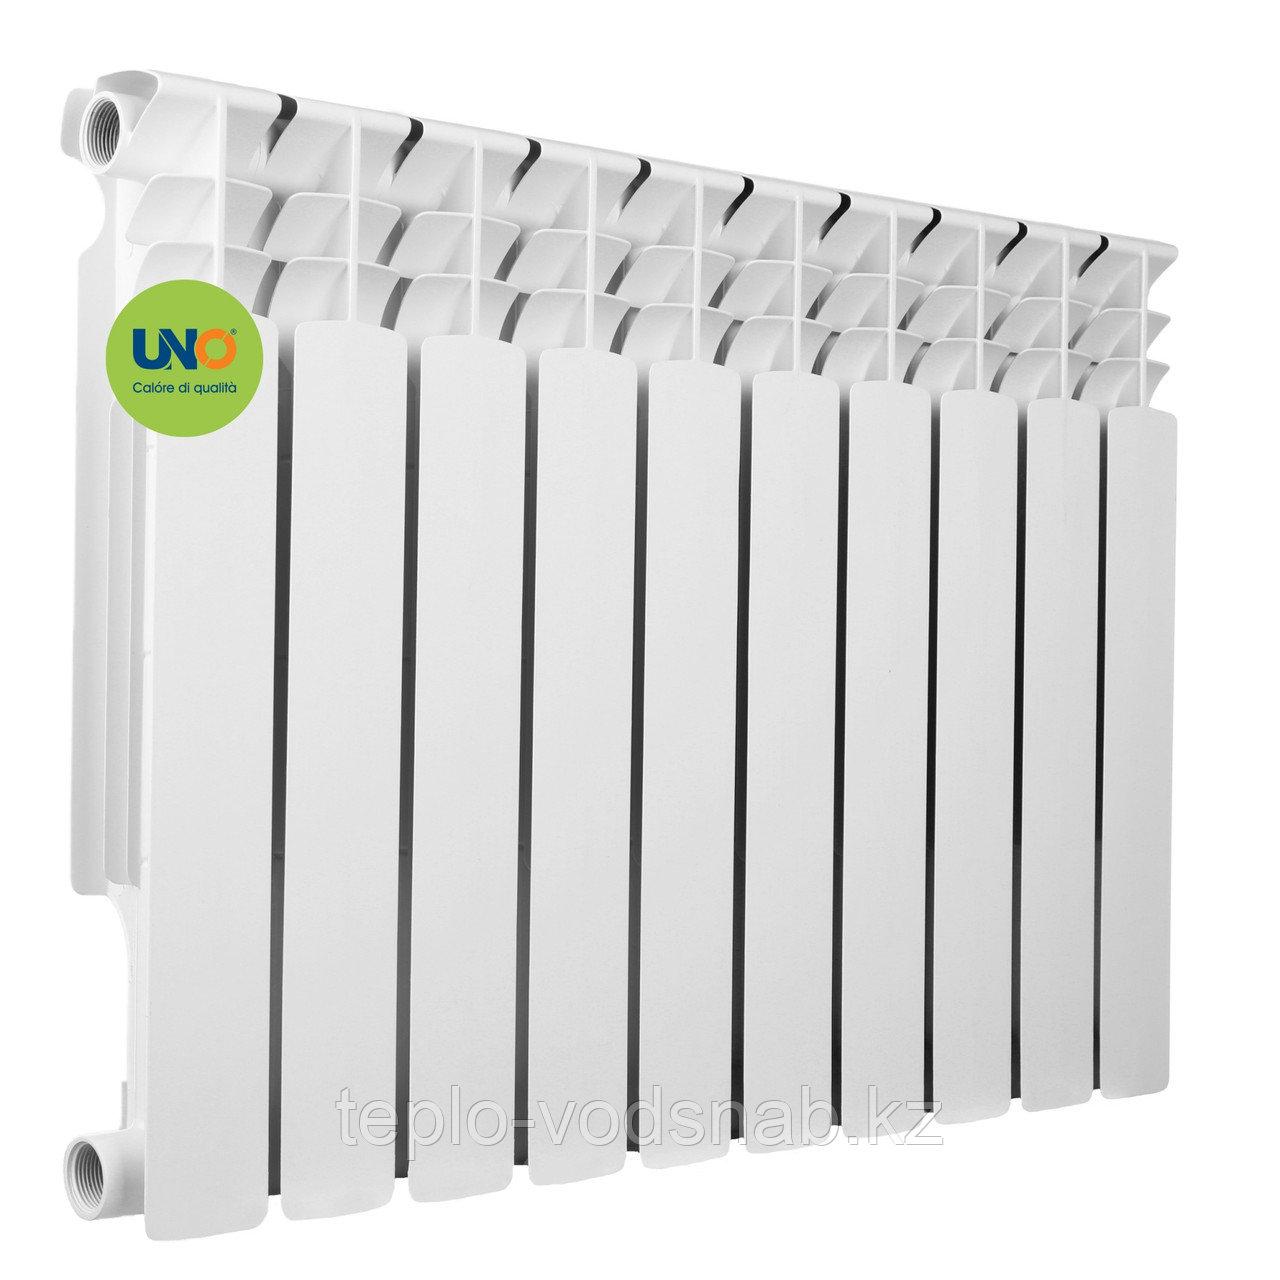 Биметаллический радиатор UNO-TENTO 500/100 (10 секц)